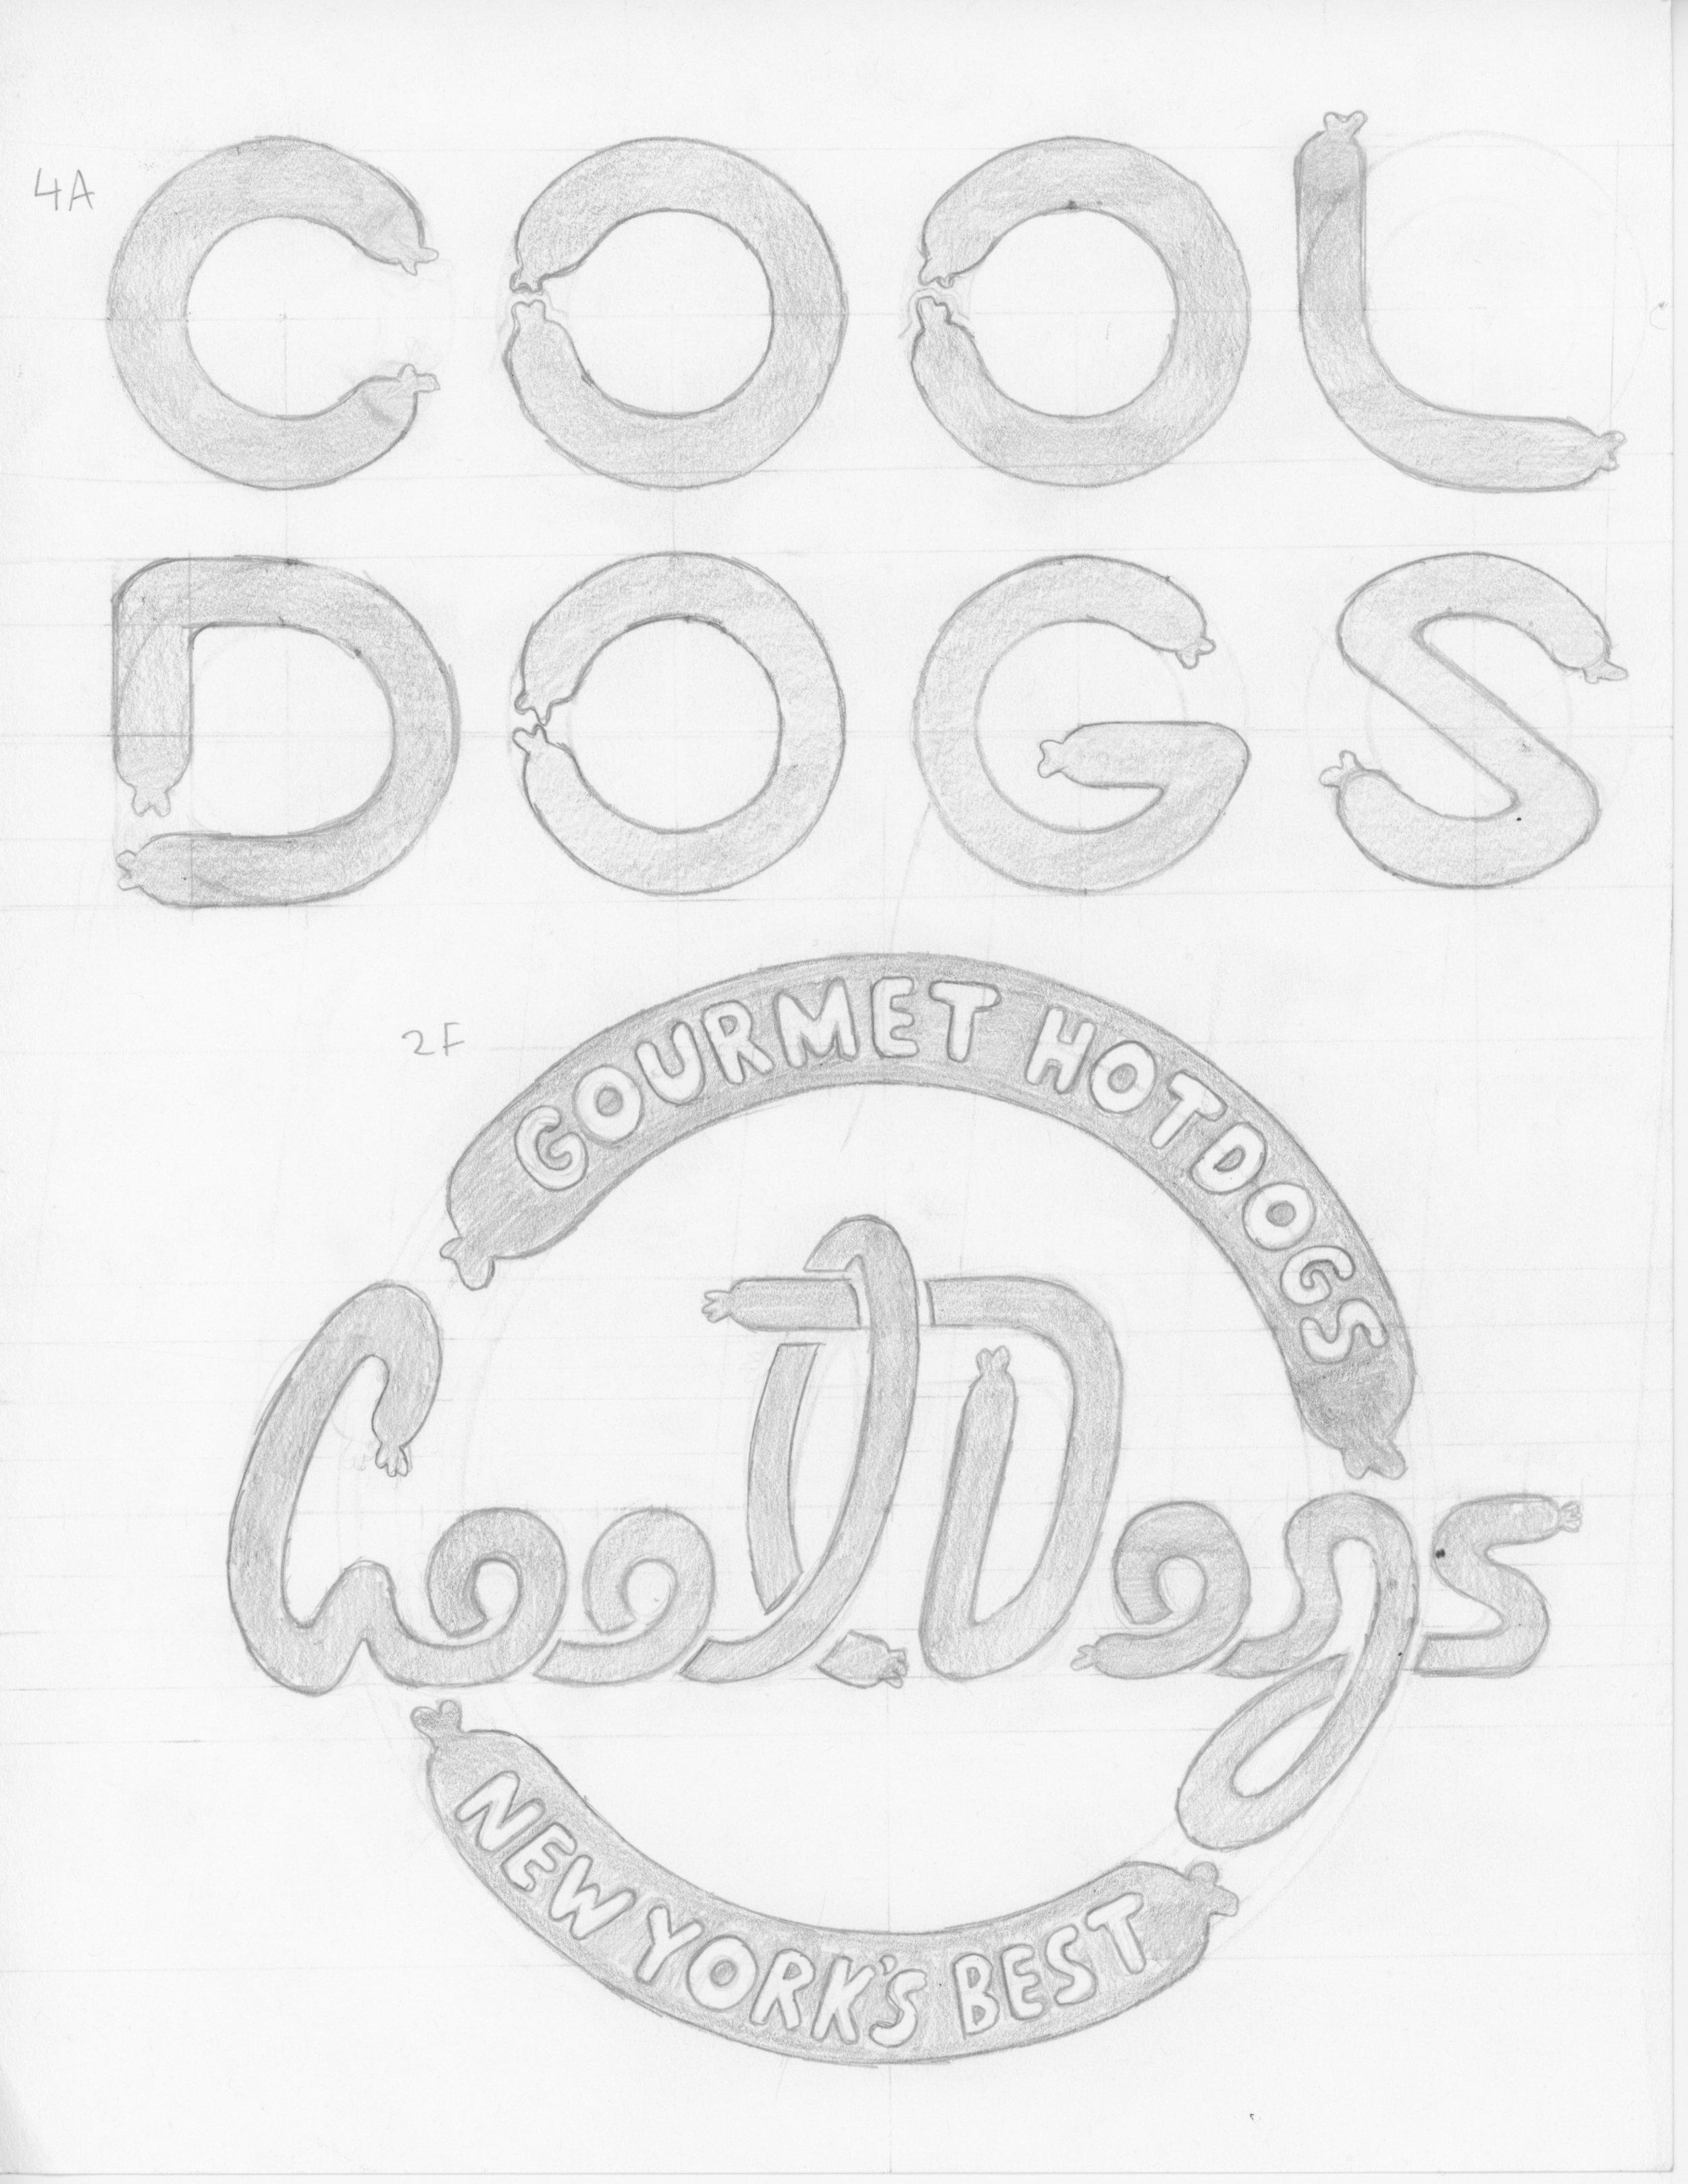 cooldogs-logo-branding-logodesign-hotdog-food-brand-orozcodesign-roberto-orozco-artist-graphicdesign-vegas-lasvegas-foodbrand-sketches4.jpg